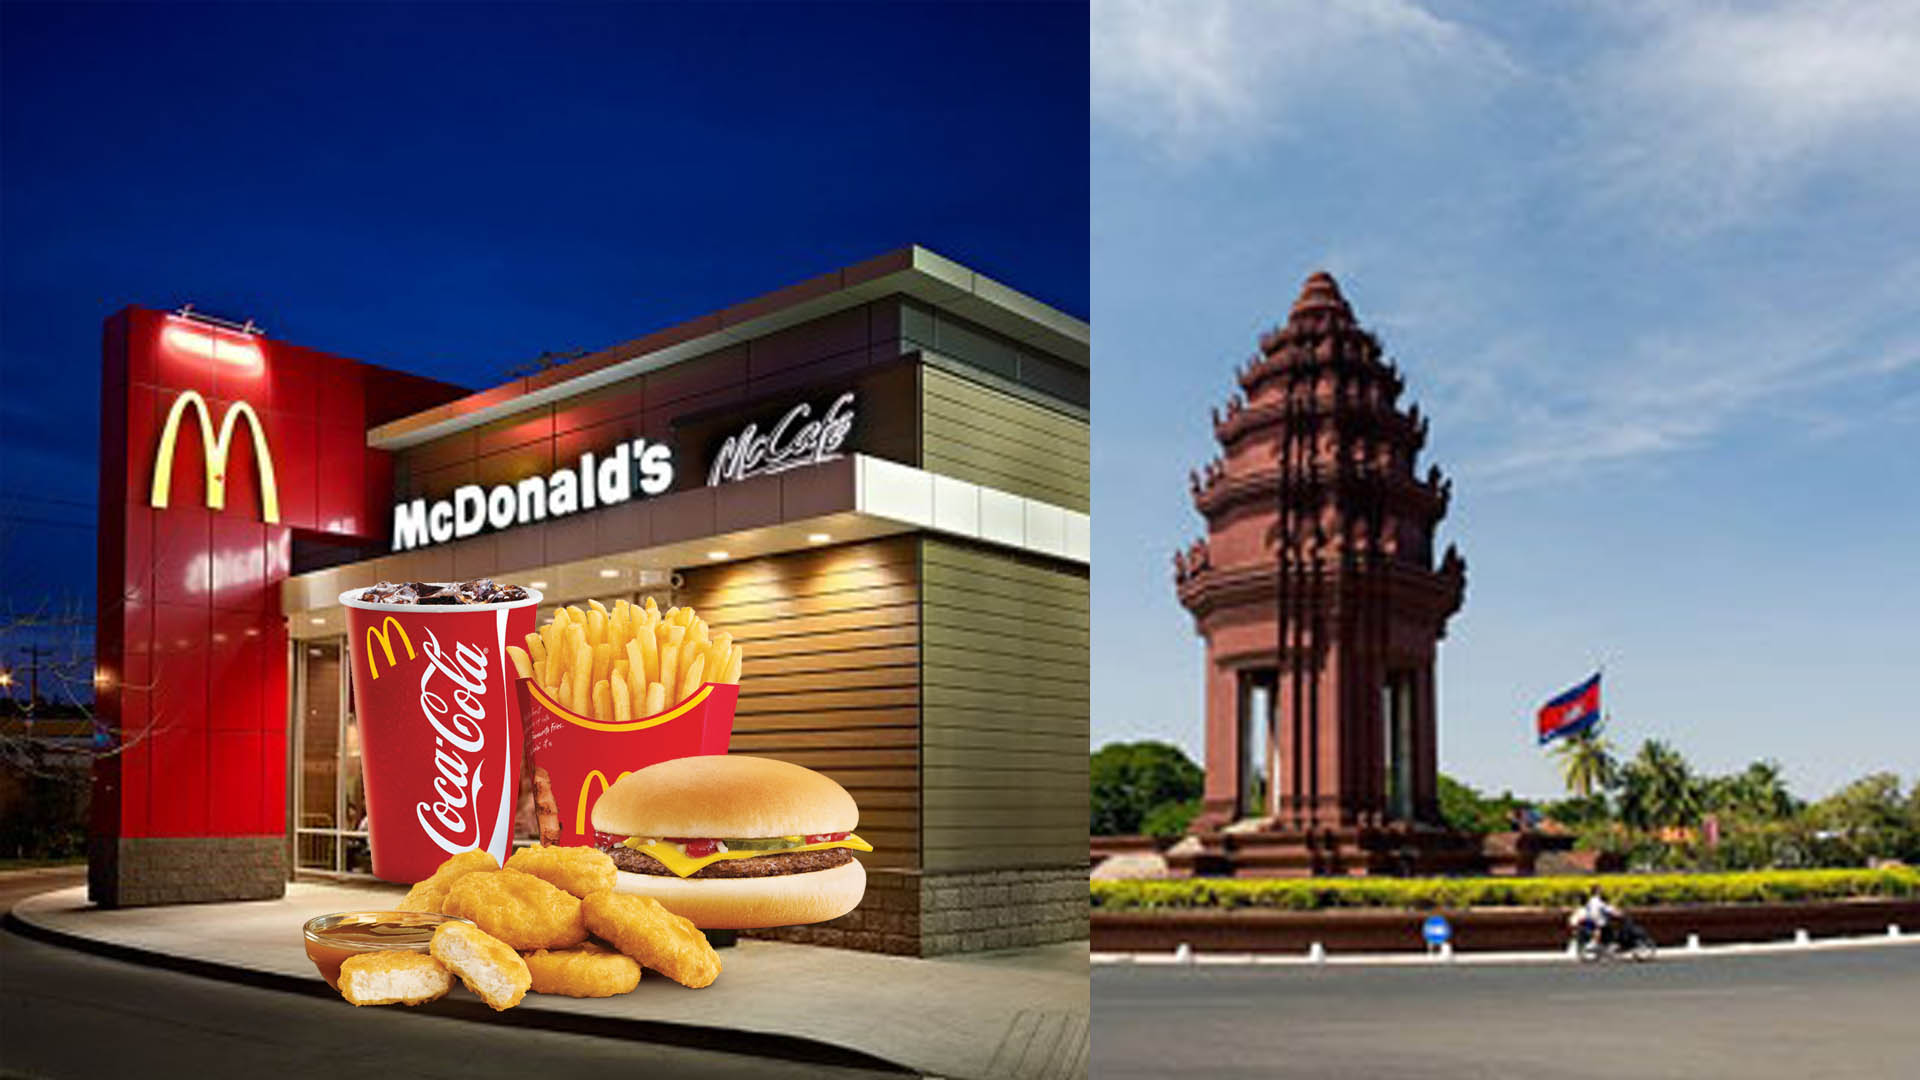 McDonald's លើកហេតុផល៣ធំៗ ថាកម្ពុជាពុំទាន់ស័ក្តិសមនឹងបើកសាខារបស់ខ្លួនបាន